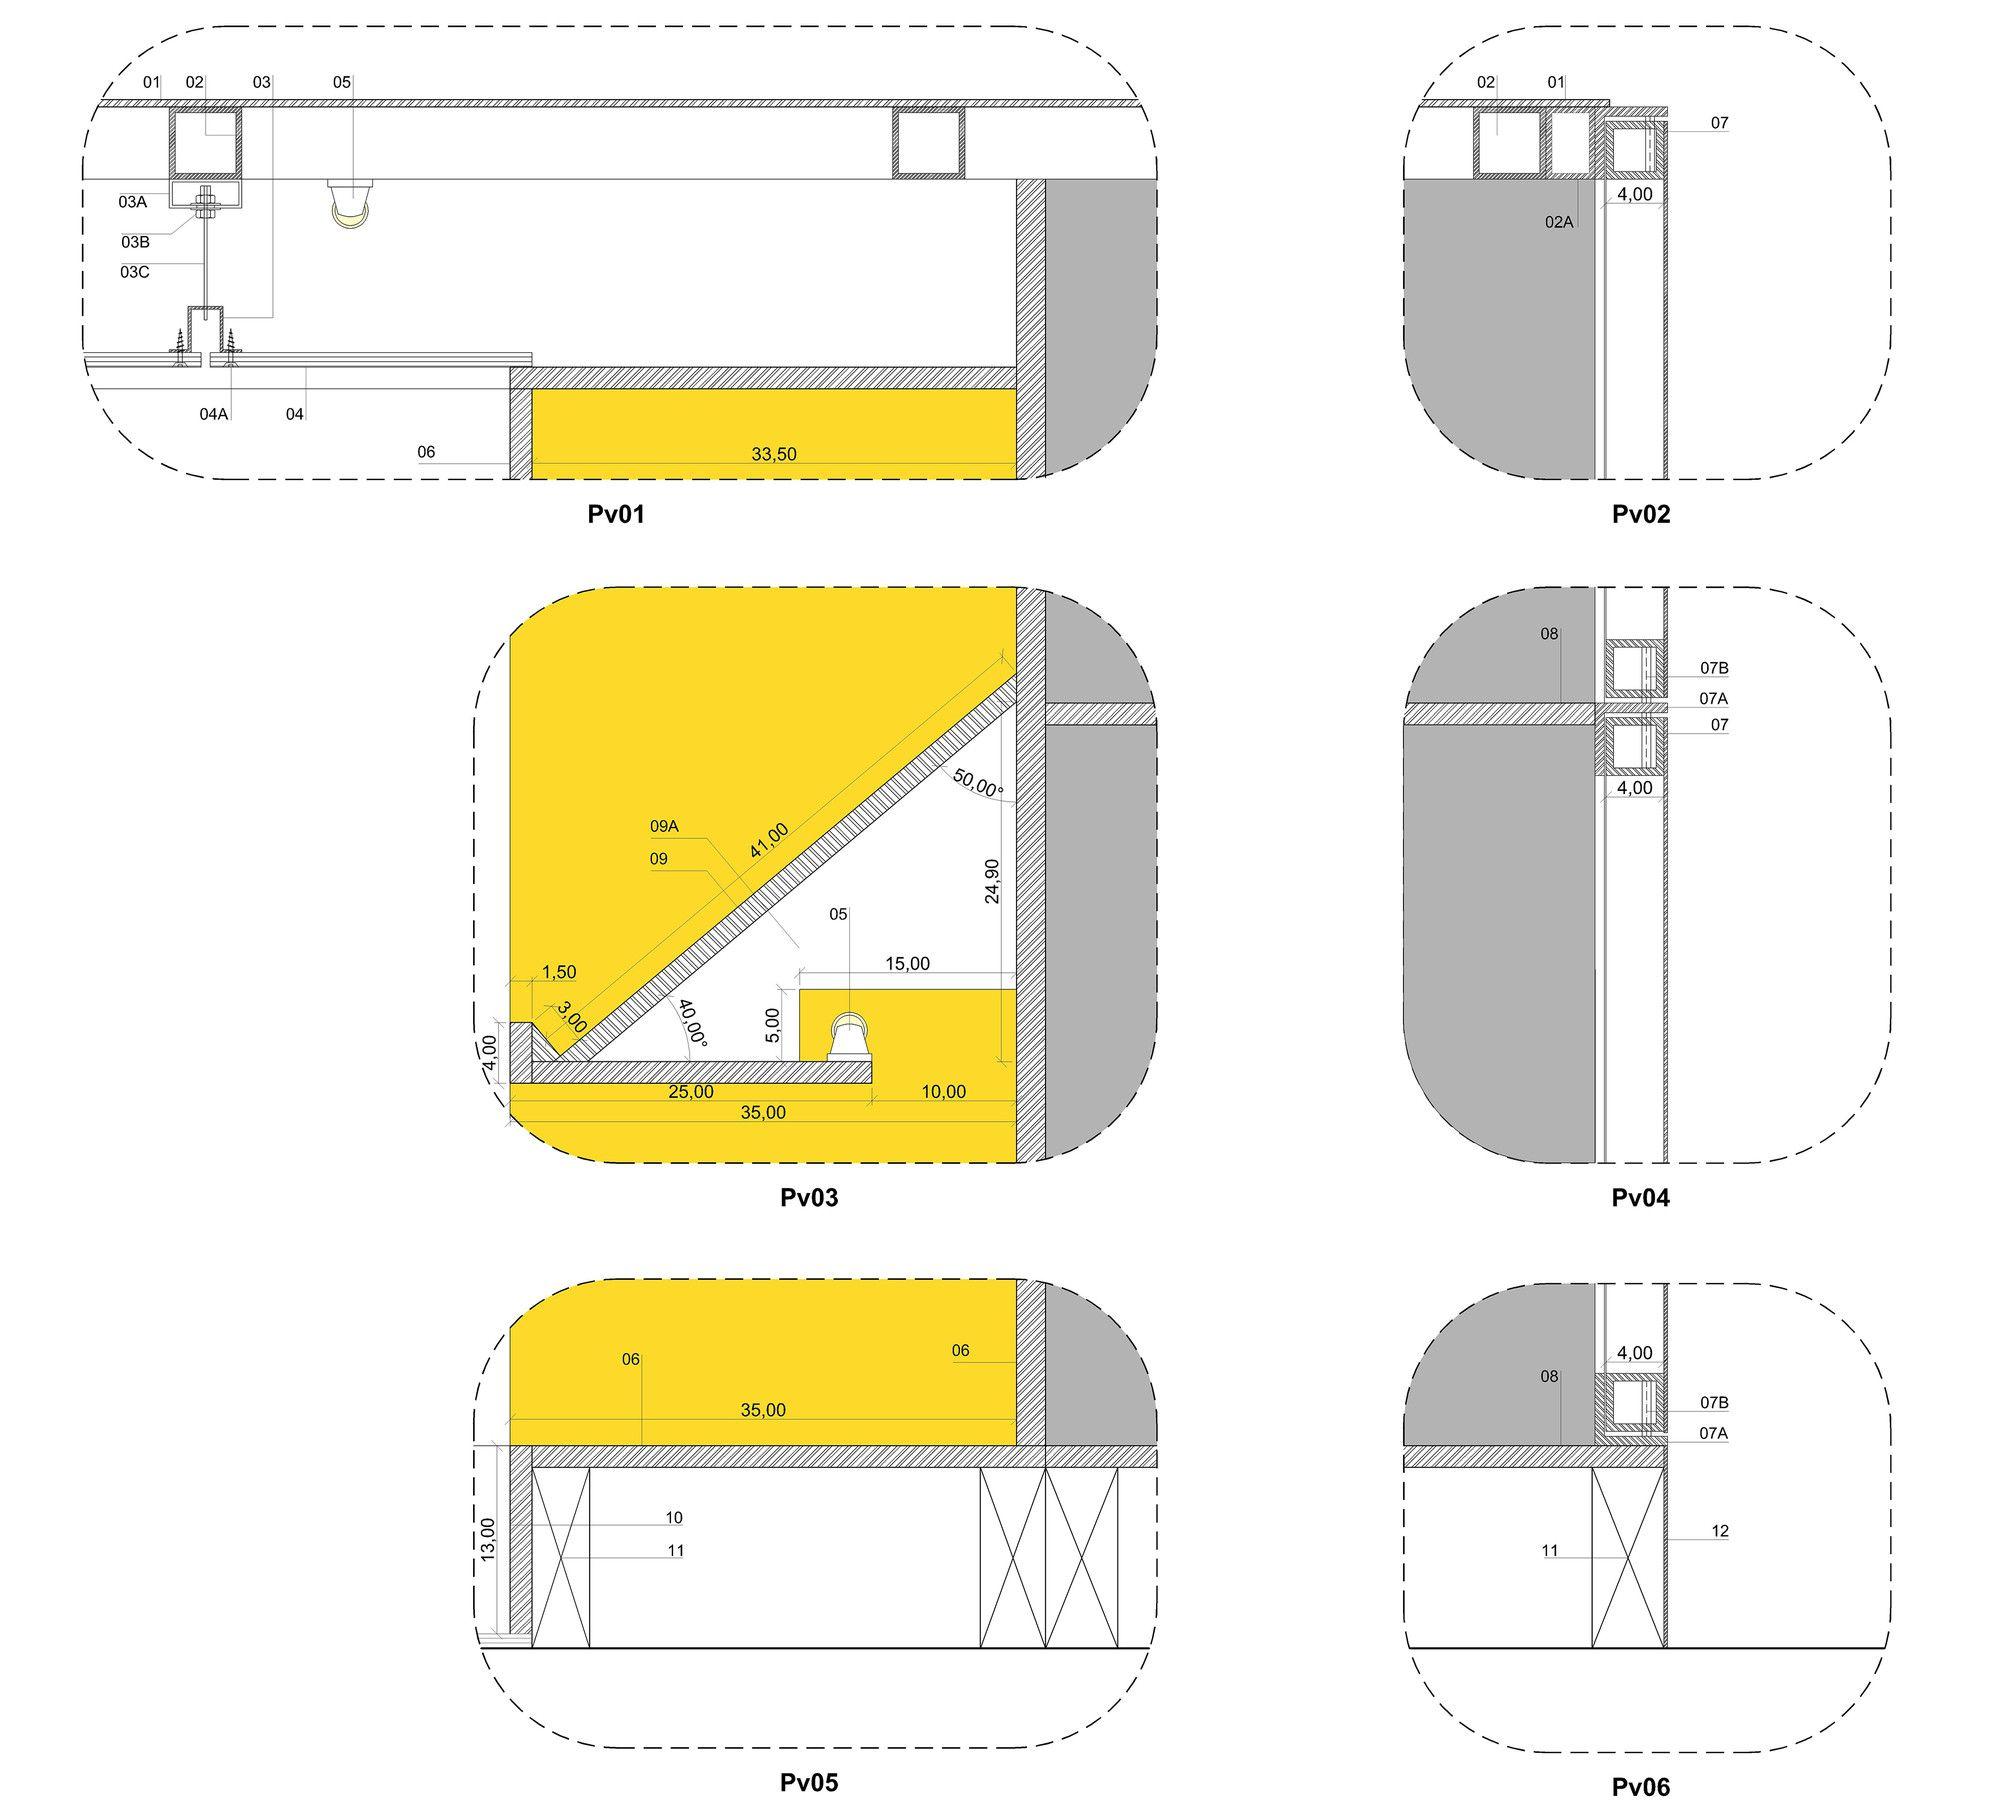 2000x1810 Gallery Of Plataforma Zero Kiosk